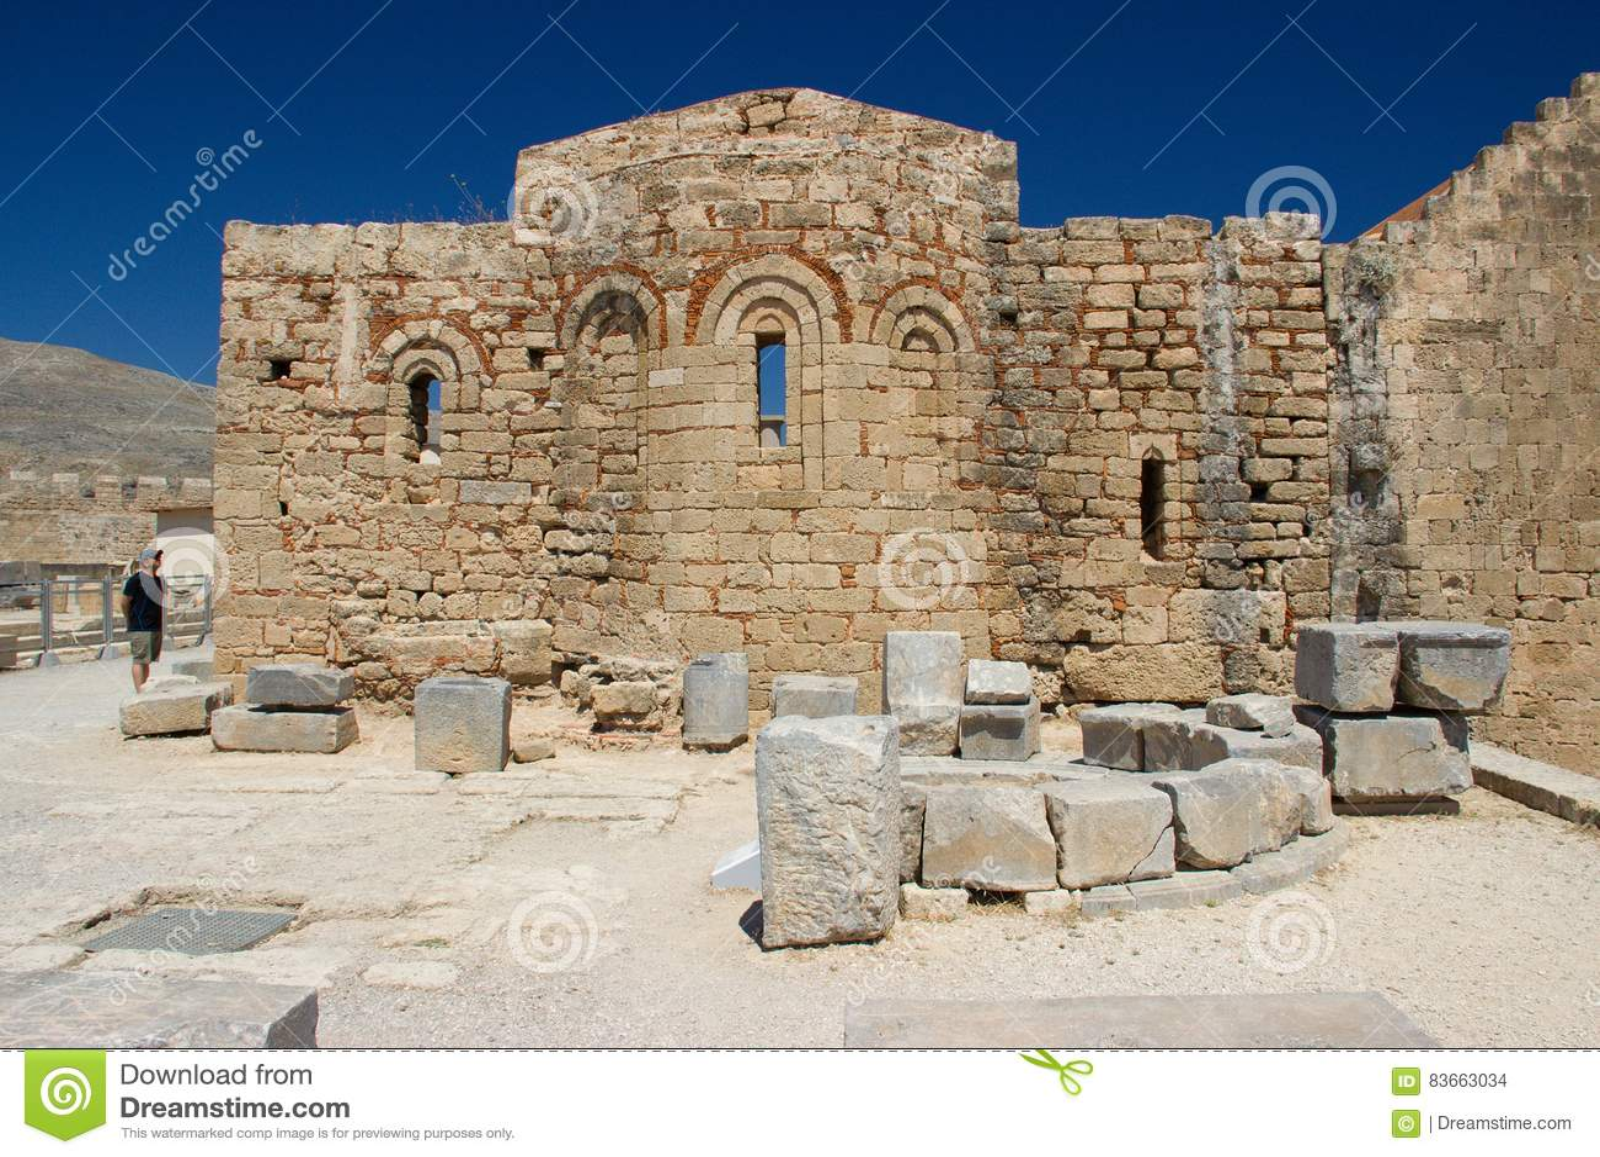 Rhodos Greece architecture historic buildings